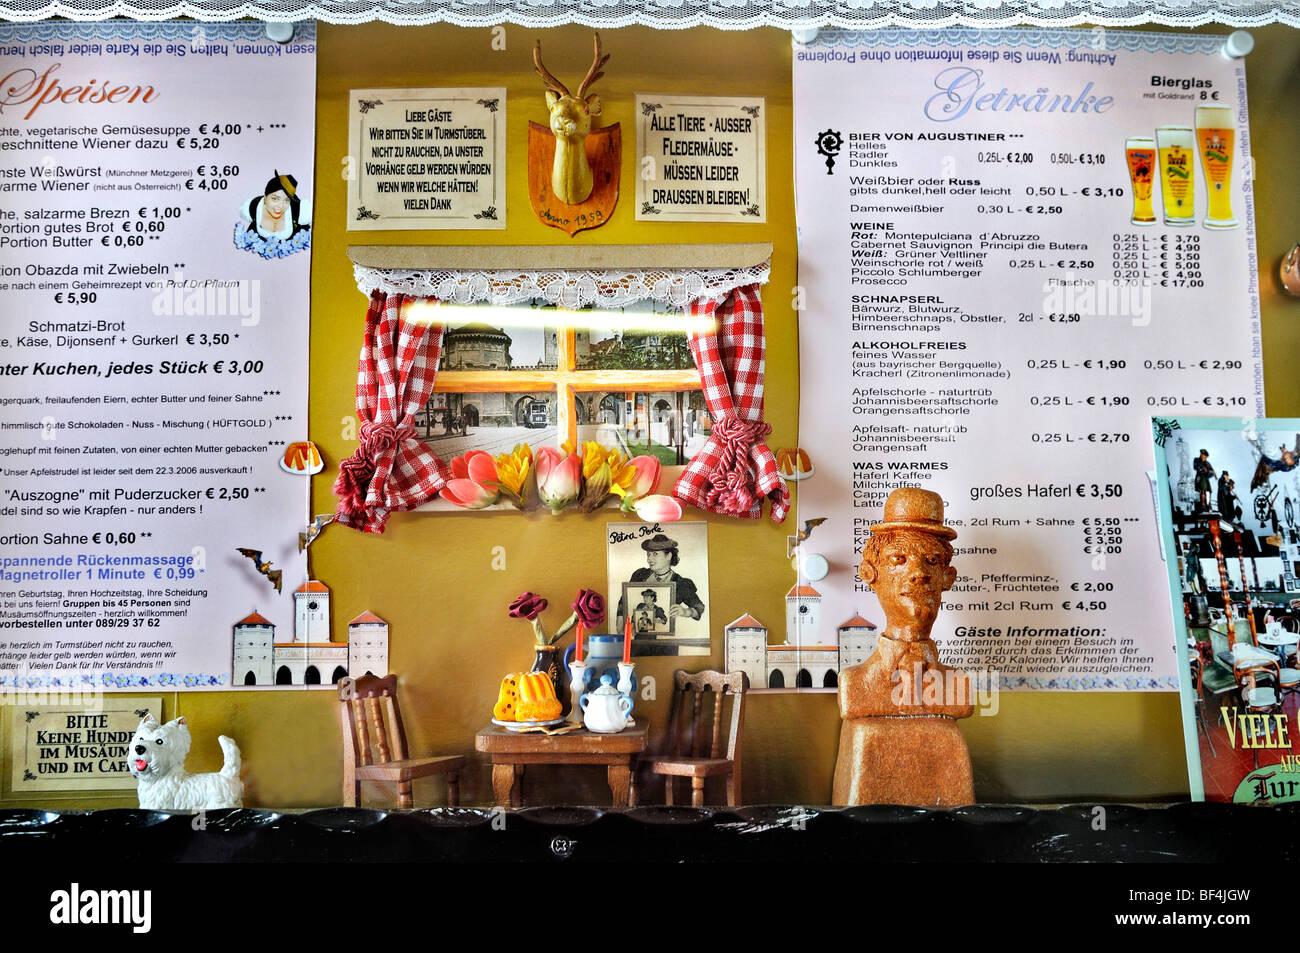 Food and drink menus, Valentin Karlstadt Musaeum on Isartor gate, Munich, Bavaria, Germany, Europe - Stock Image